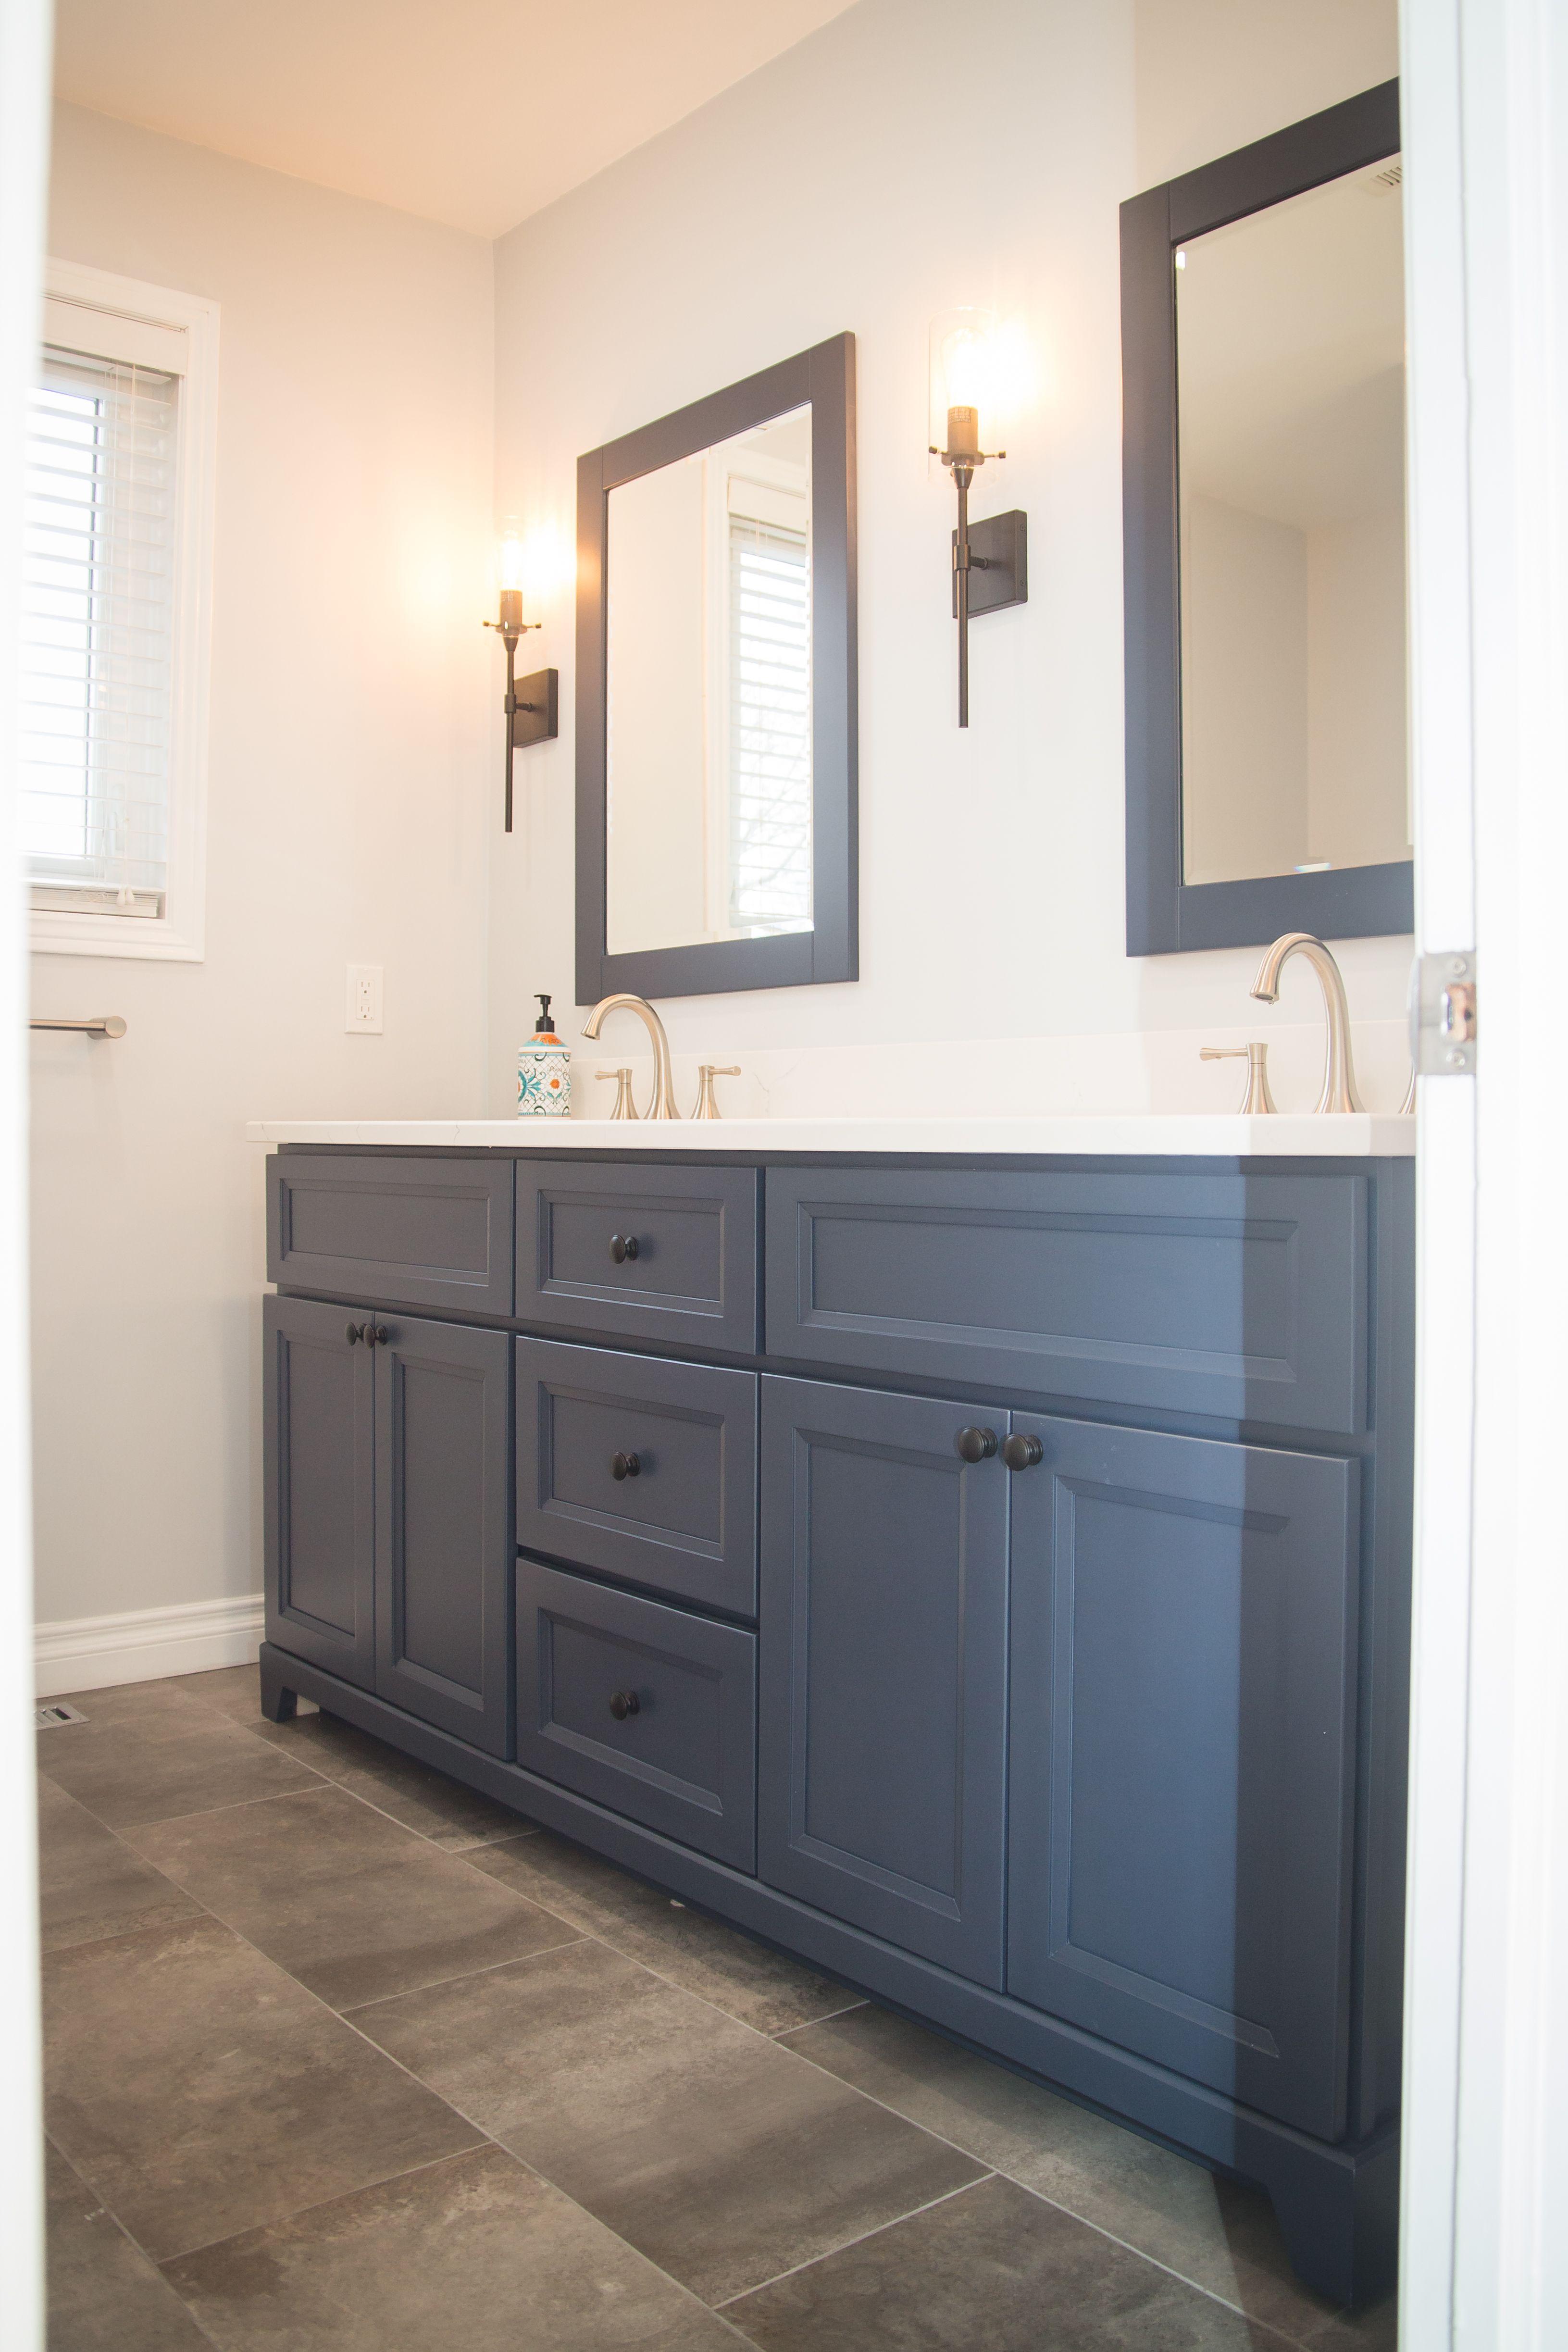 Bathroom Reno Navy Grey Stonewood Vanity With Quartz Too And Matching Mirrors Slate Tile Wayfair Sconces Grey Bathrooms Bathroom Slate Bathroom Tile